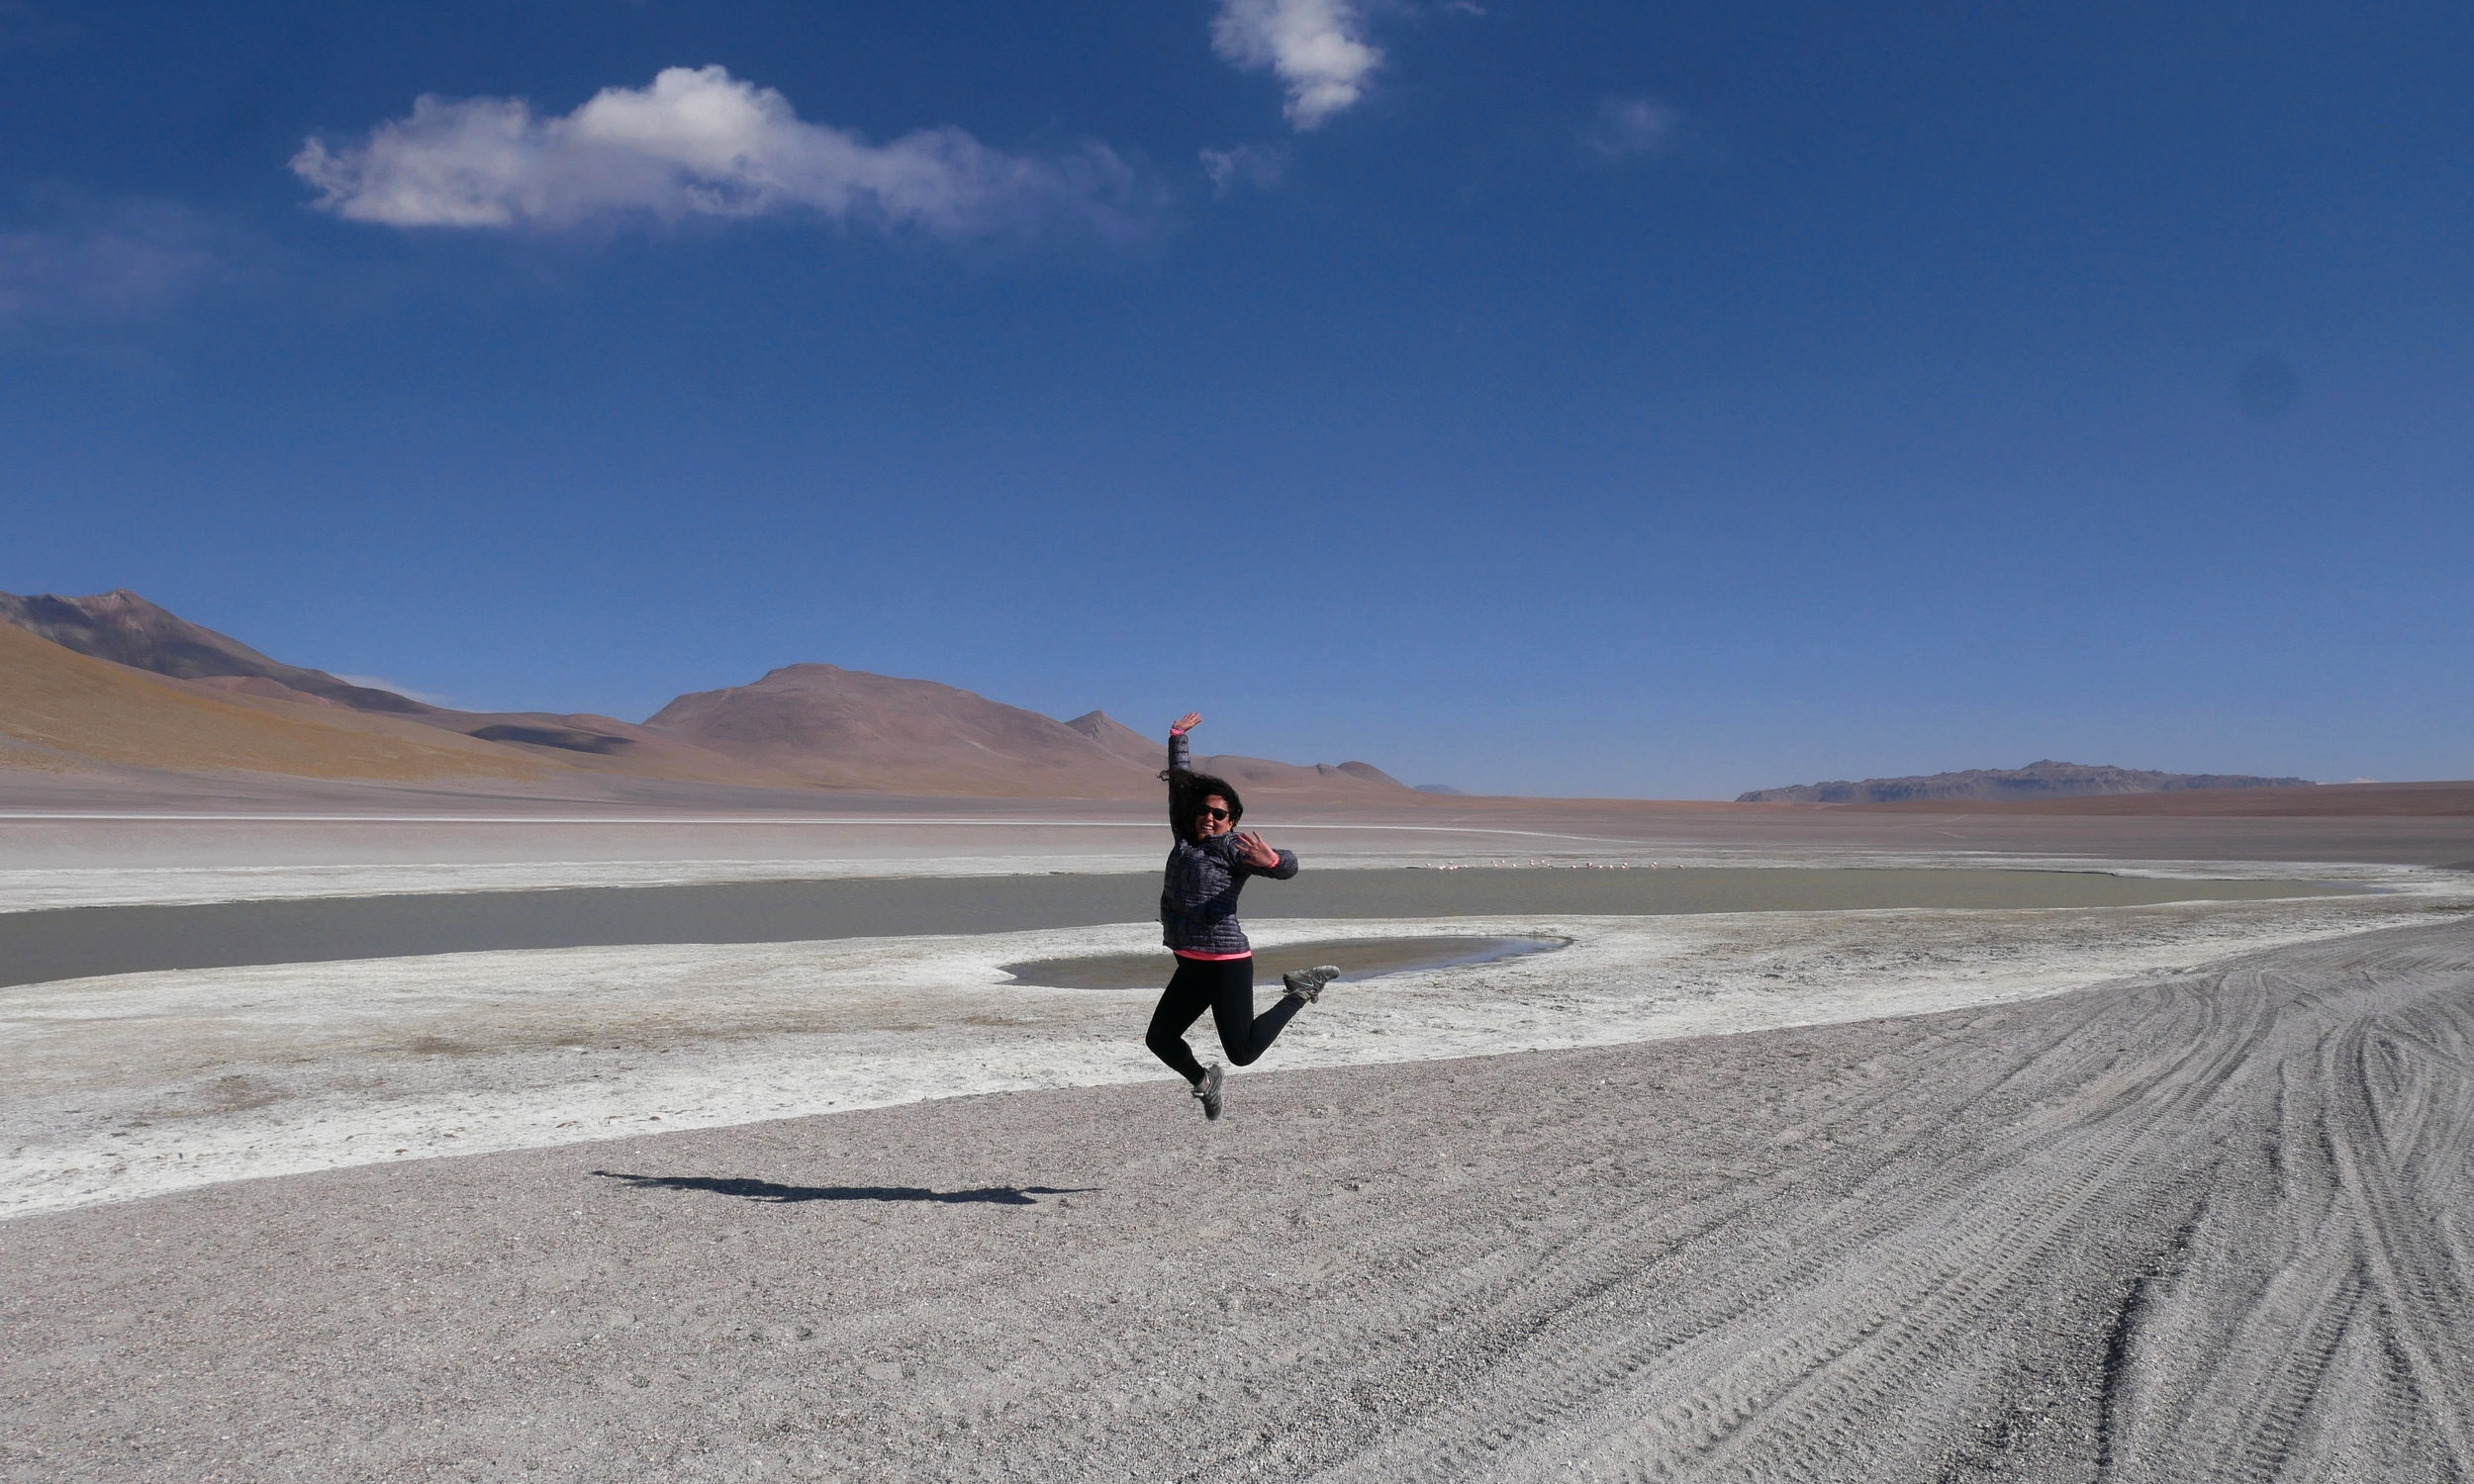 Jumping for joy in the Uyuni Salt Flats, Bolivia